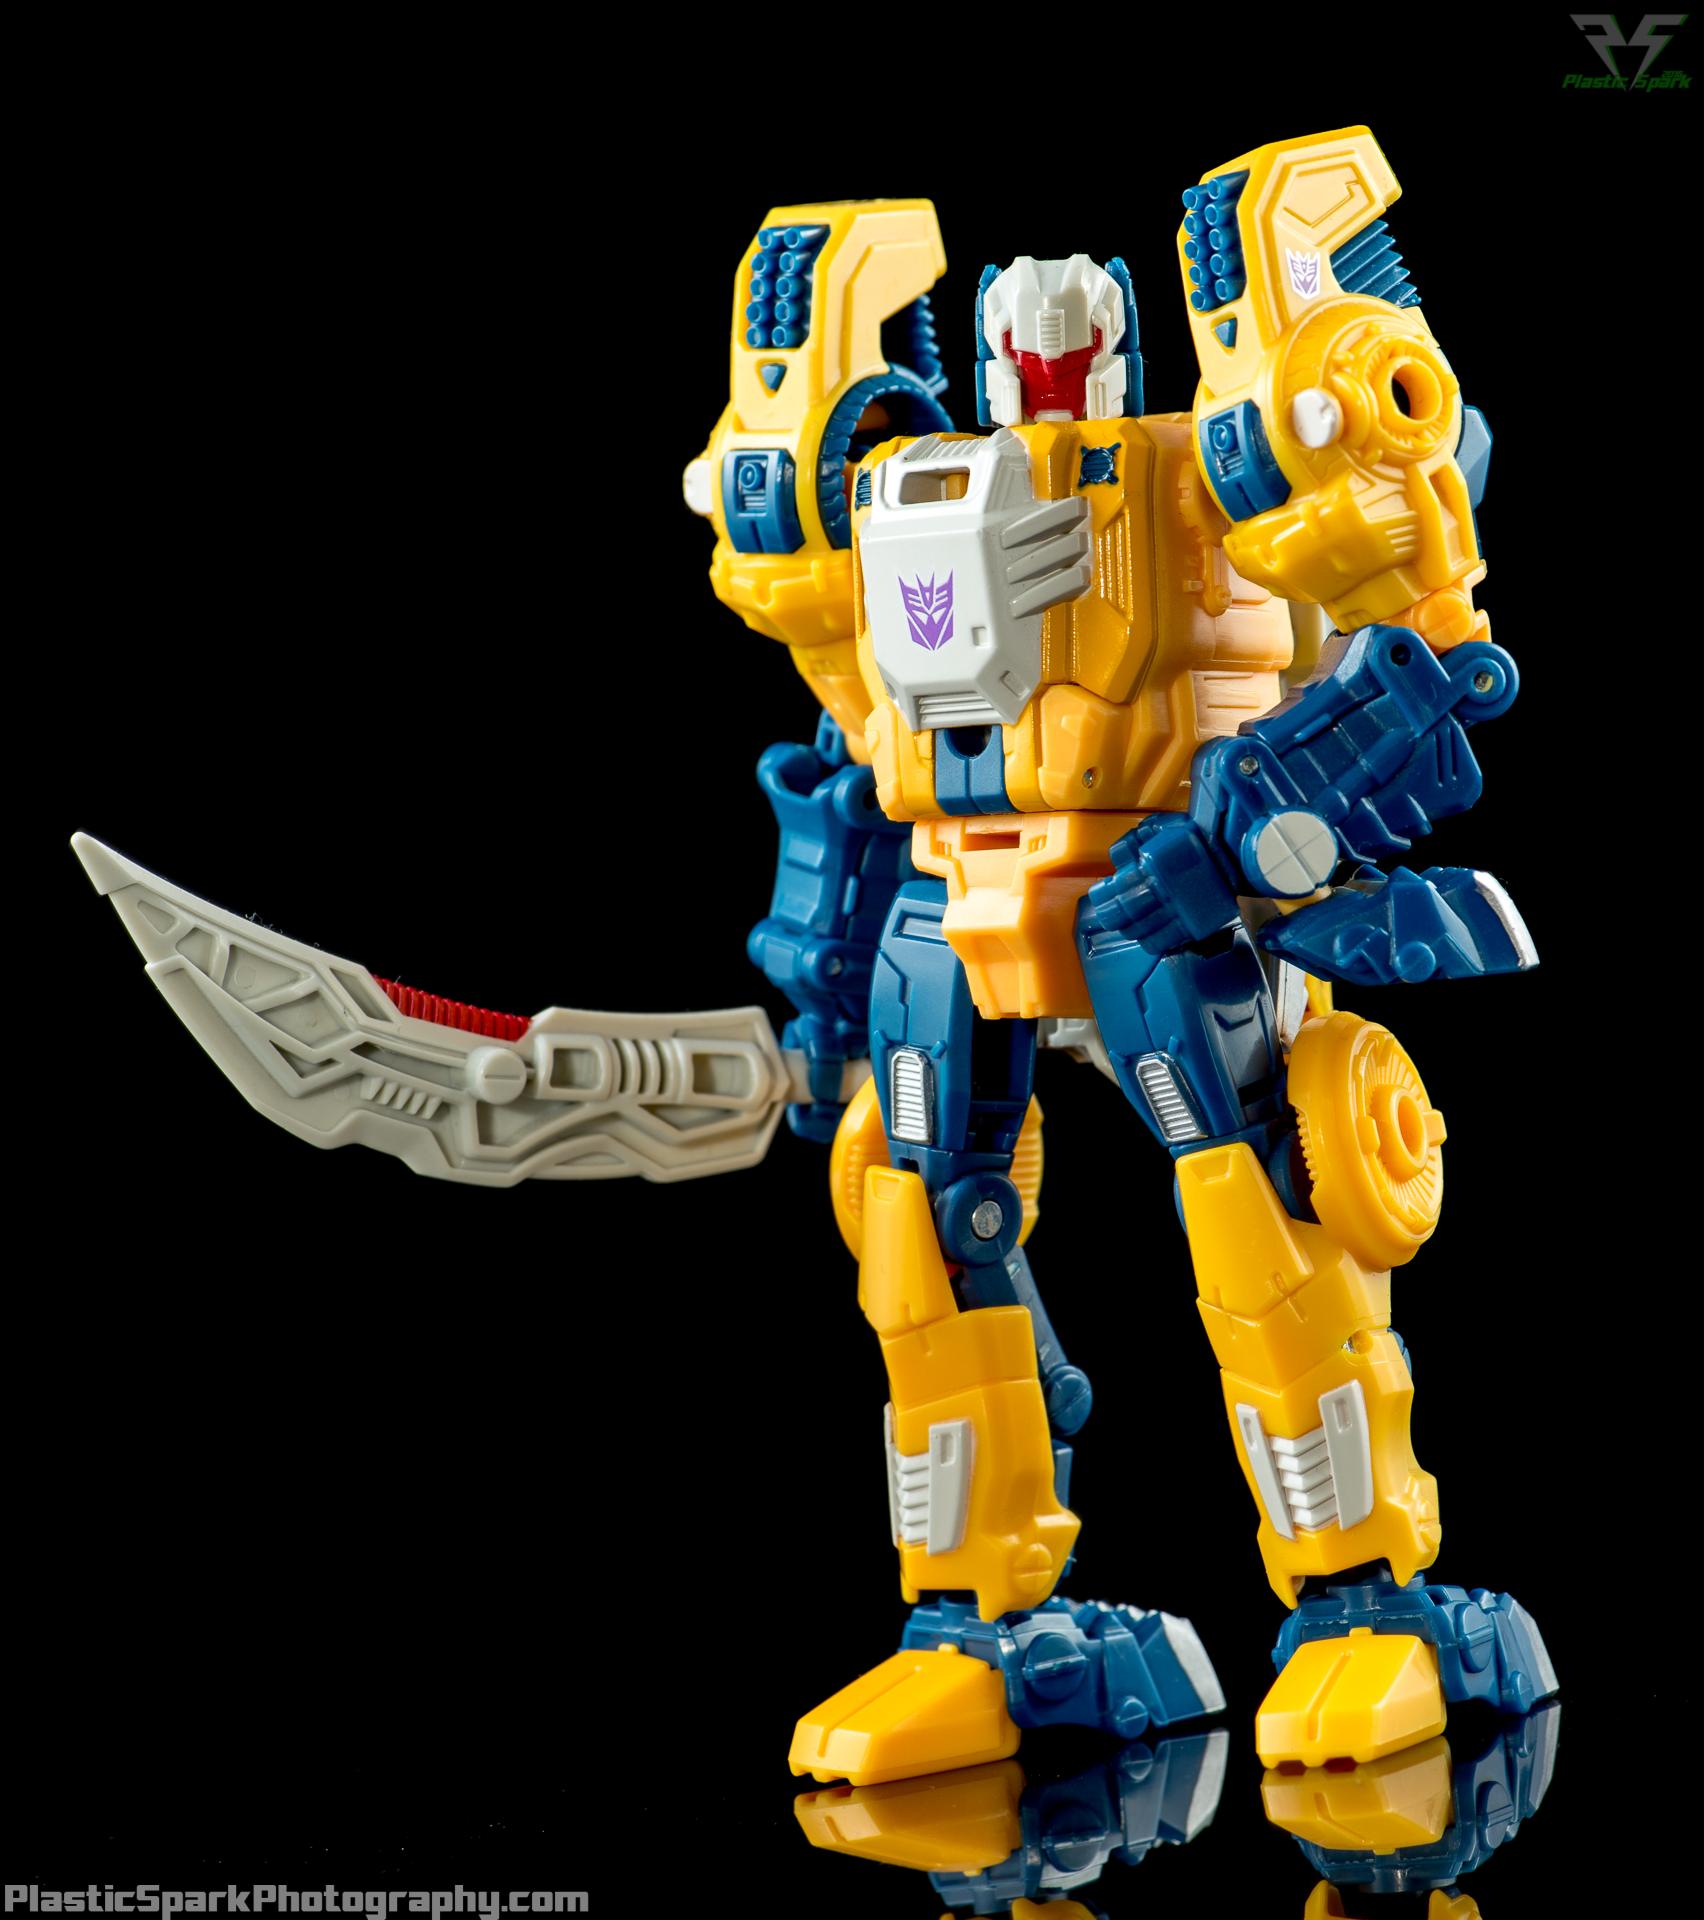 Titans-Return-Weirdwolf-(3-of-11).png